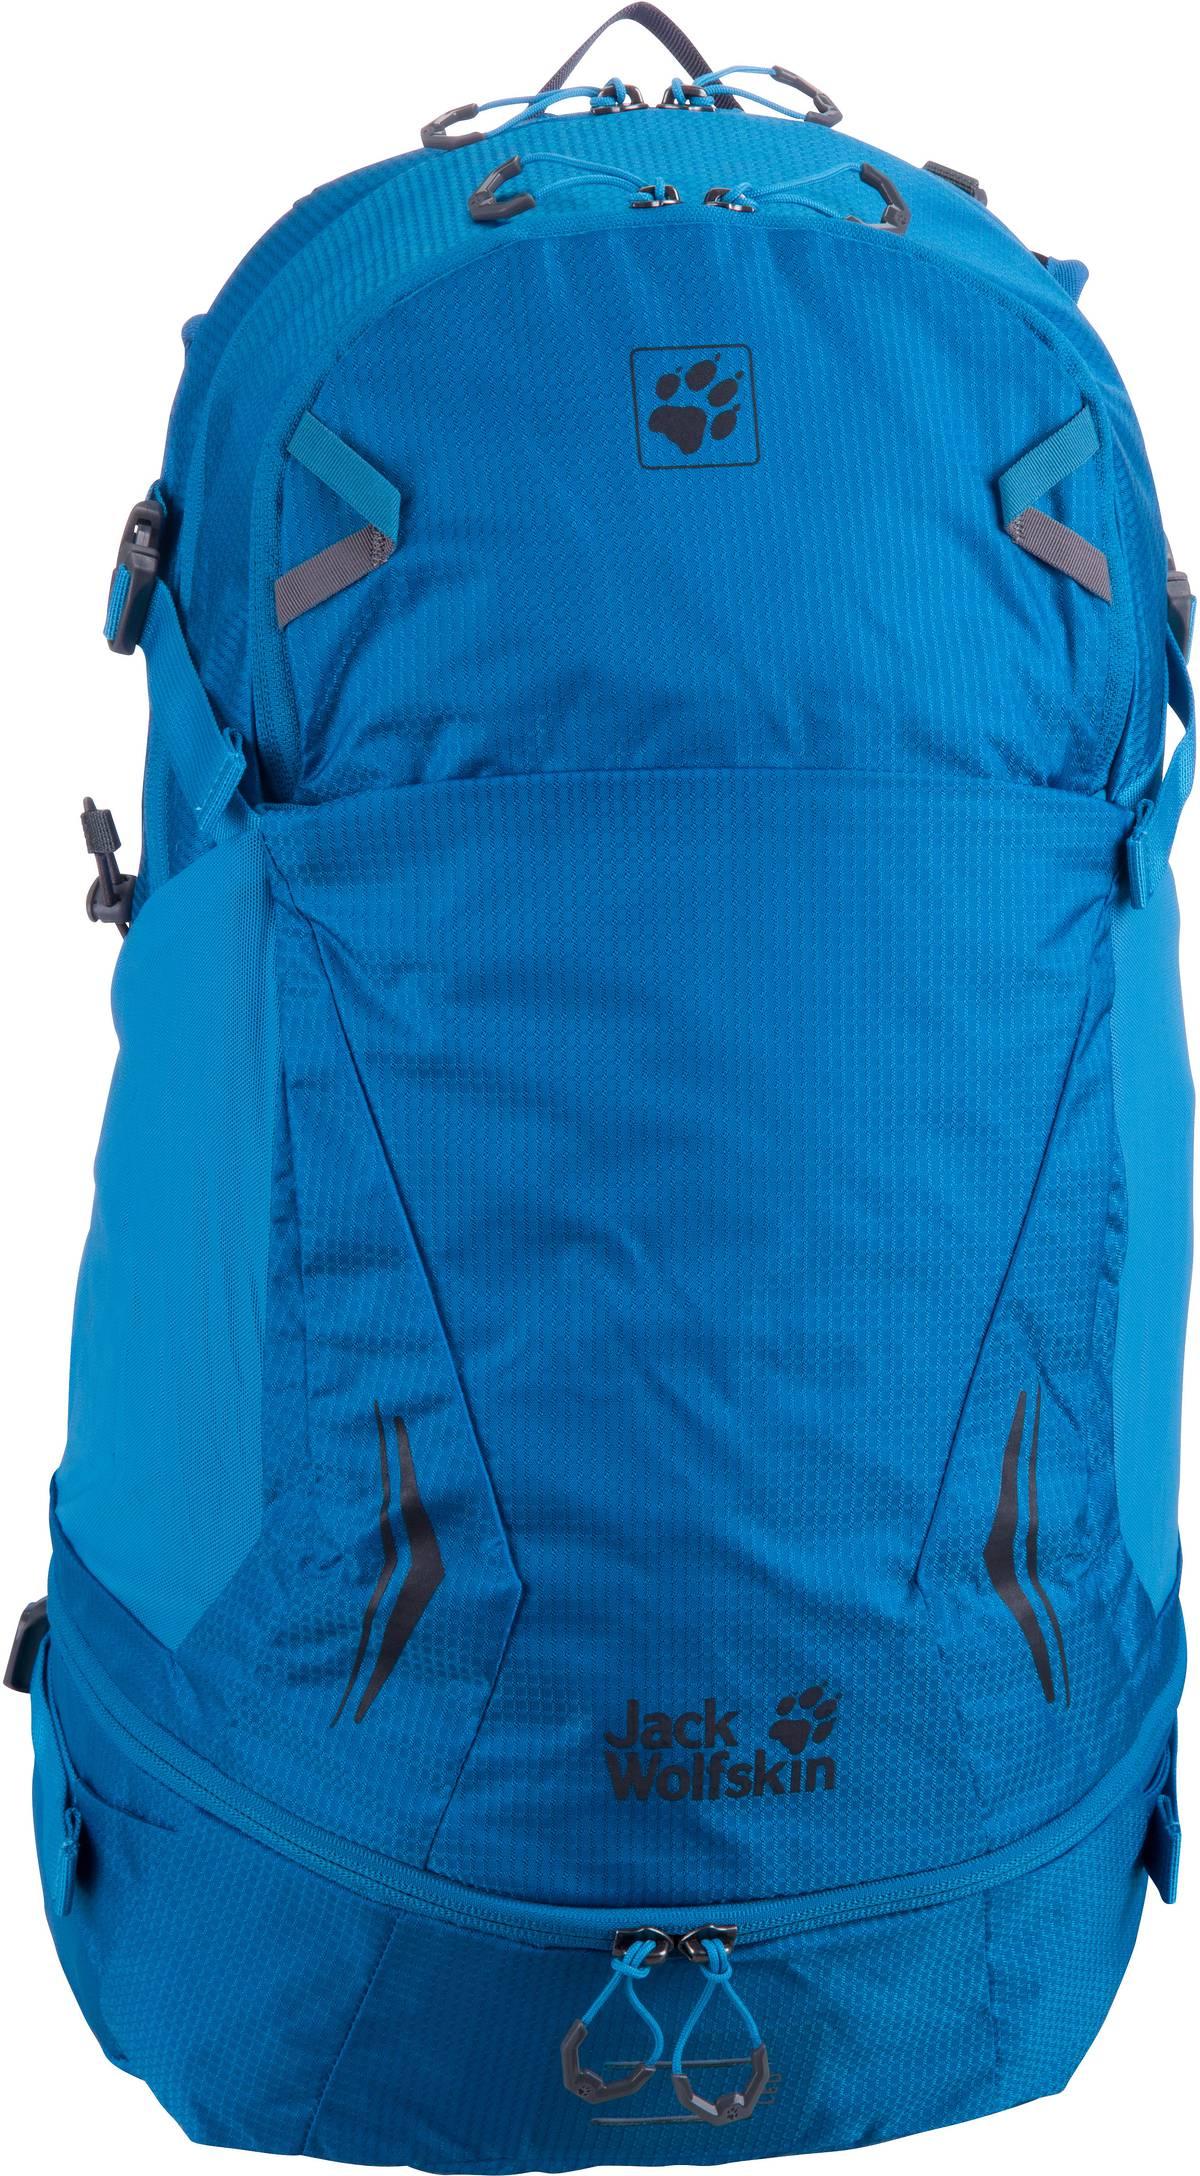 Rucksack / Daypack Moab Jam 30 Electric Blue (30 Liter)